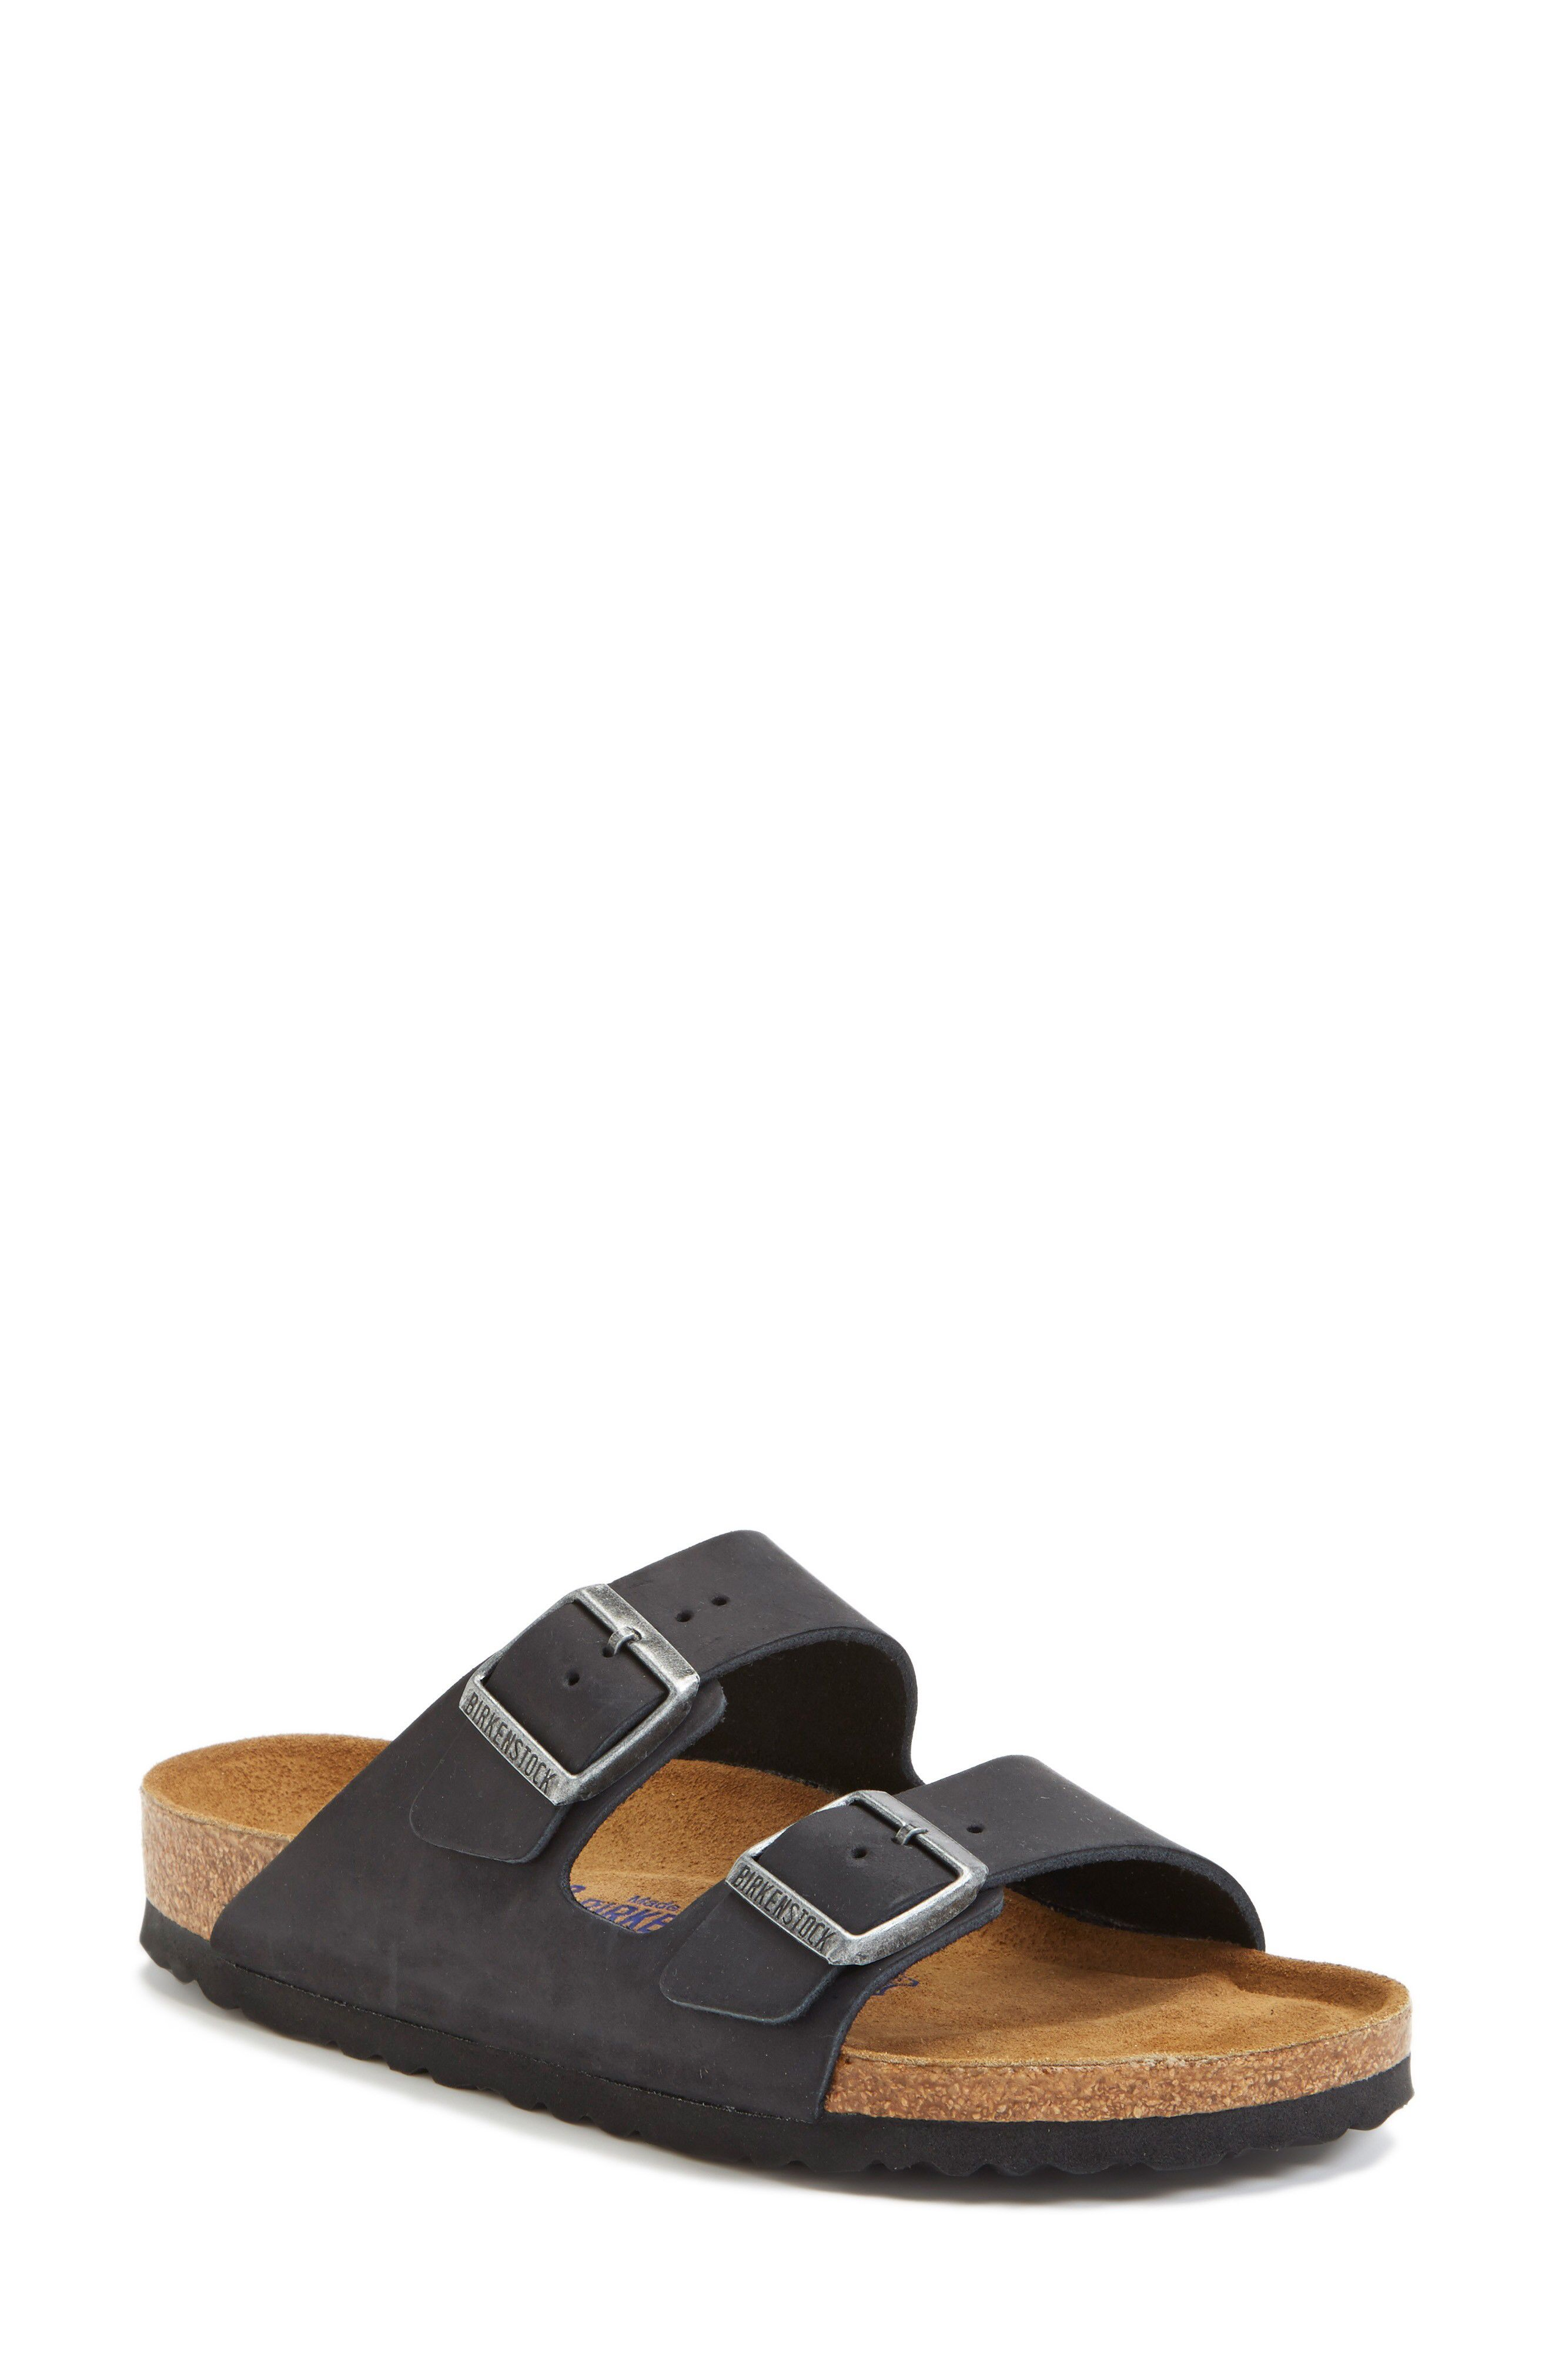 0062df857179 Birkenstock  Arizona  Soft Footbed Sandal available at  Nordstrom ...